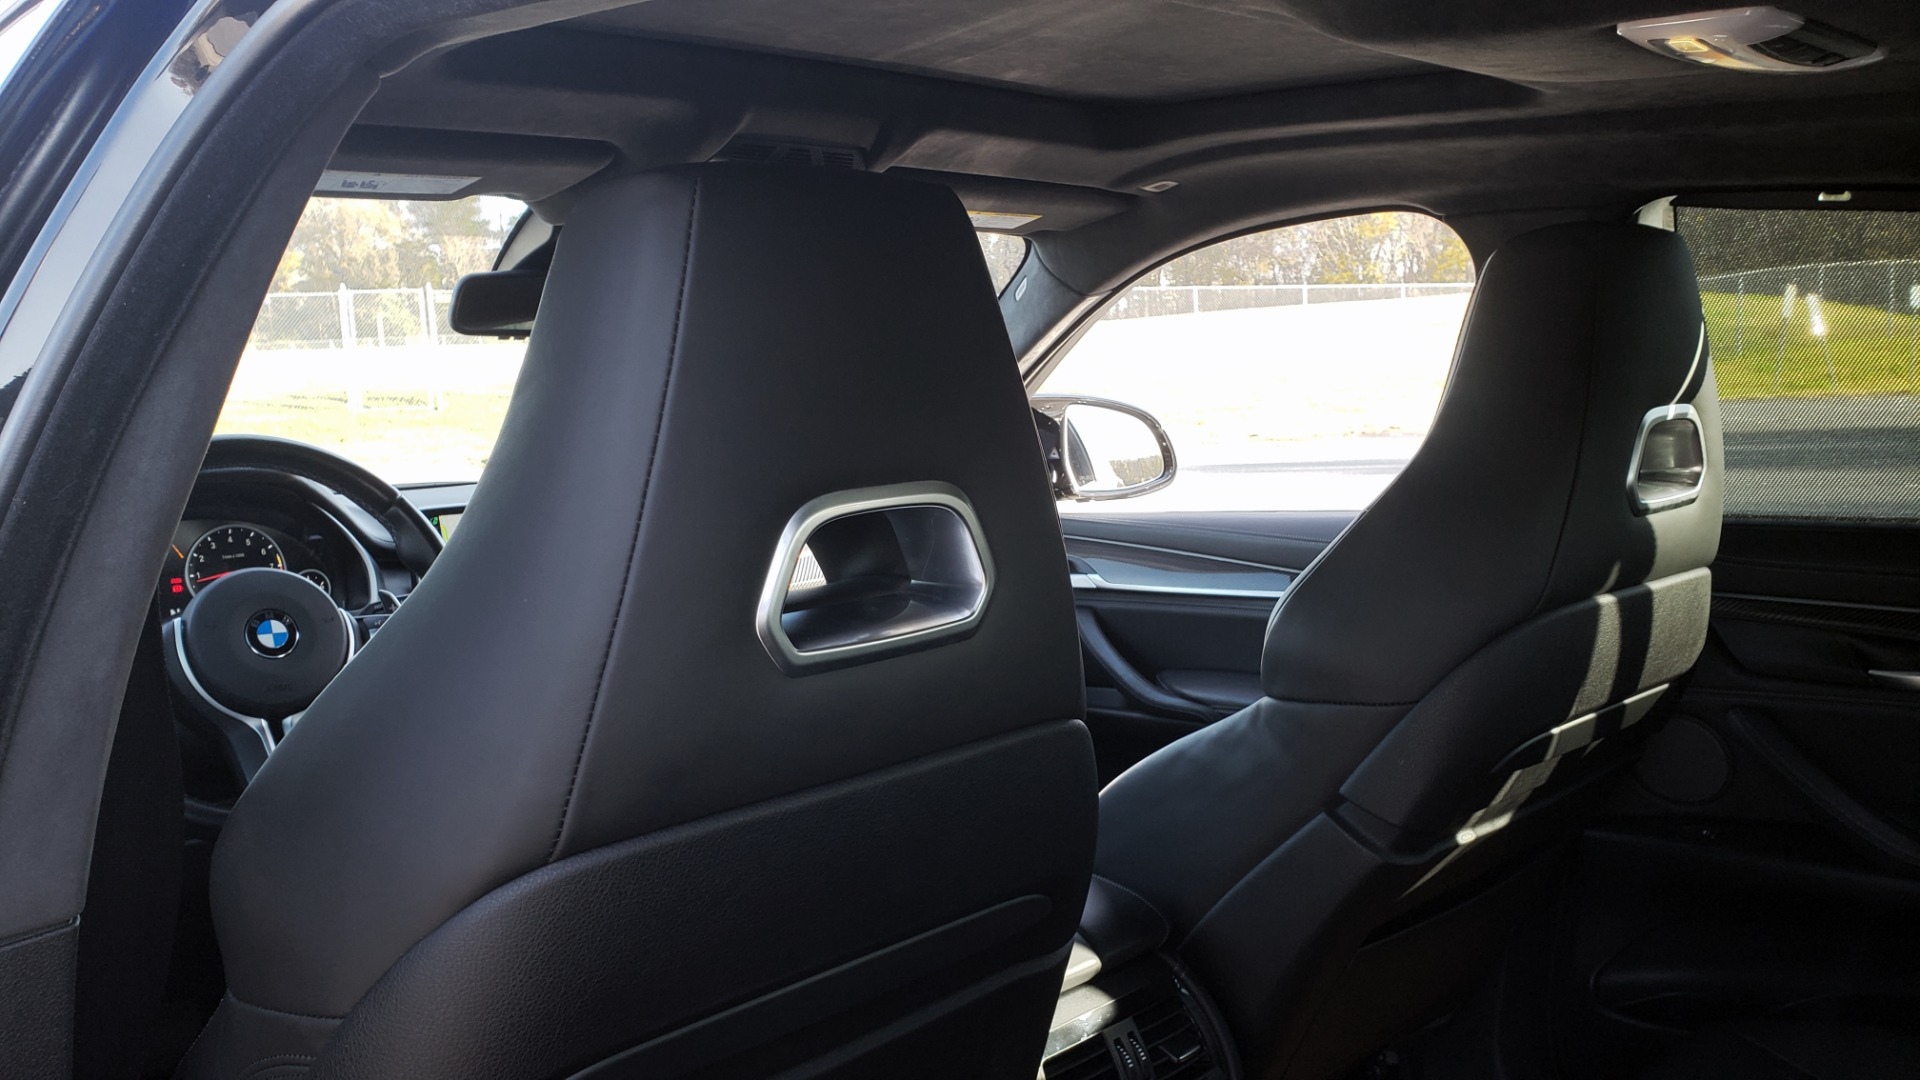 Used 2016 BMW X6 M EXEC PKG / DRVR ASST / NAV / SUNROOF / BLIND SPOT / REARVIEW for sale Sold at Formula Imports in Charlotte NC 28227 67